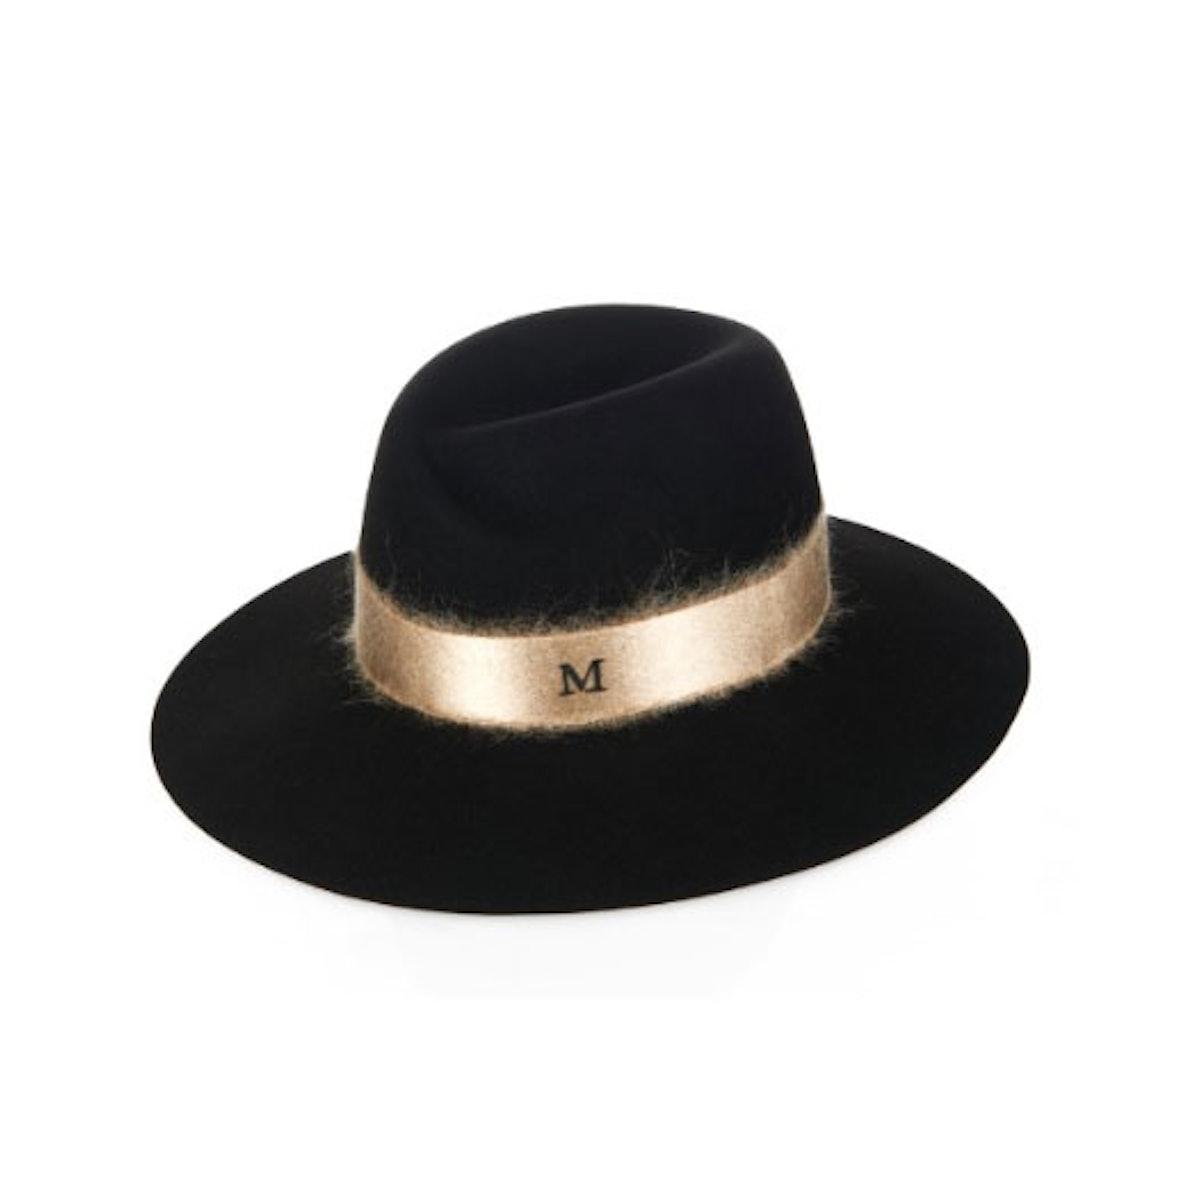 Maison Michele Virginie fur-felt hat